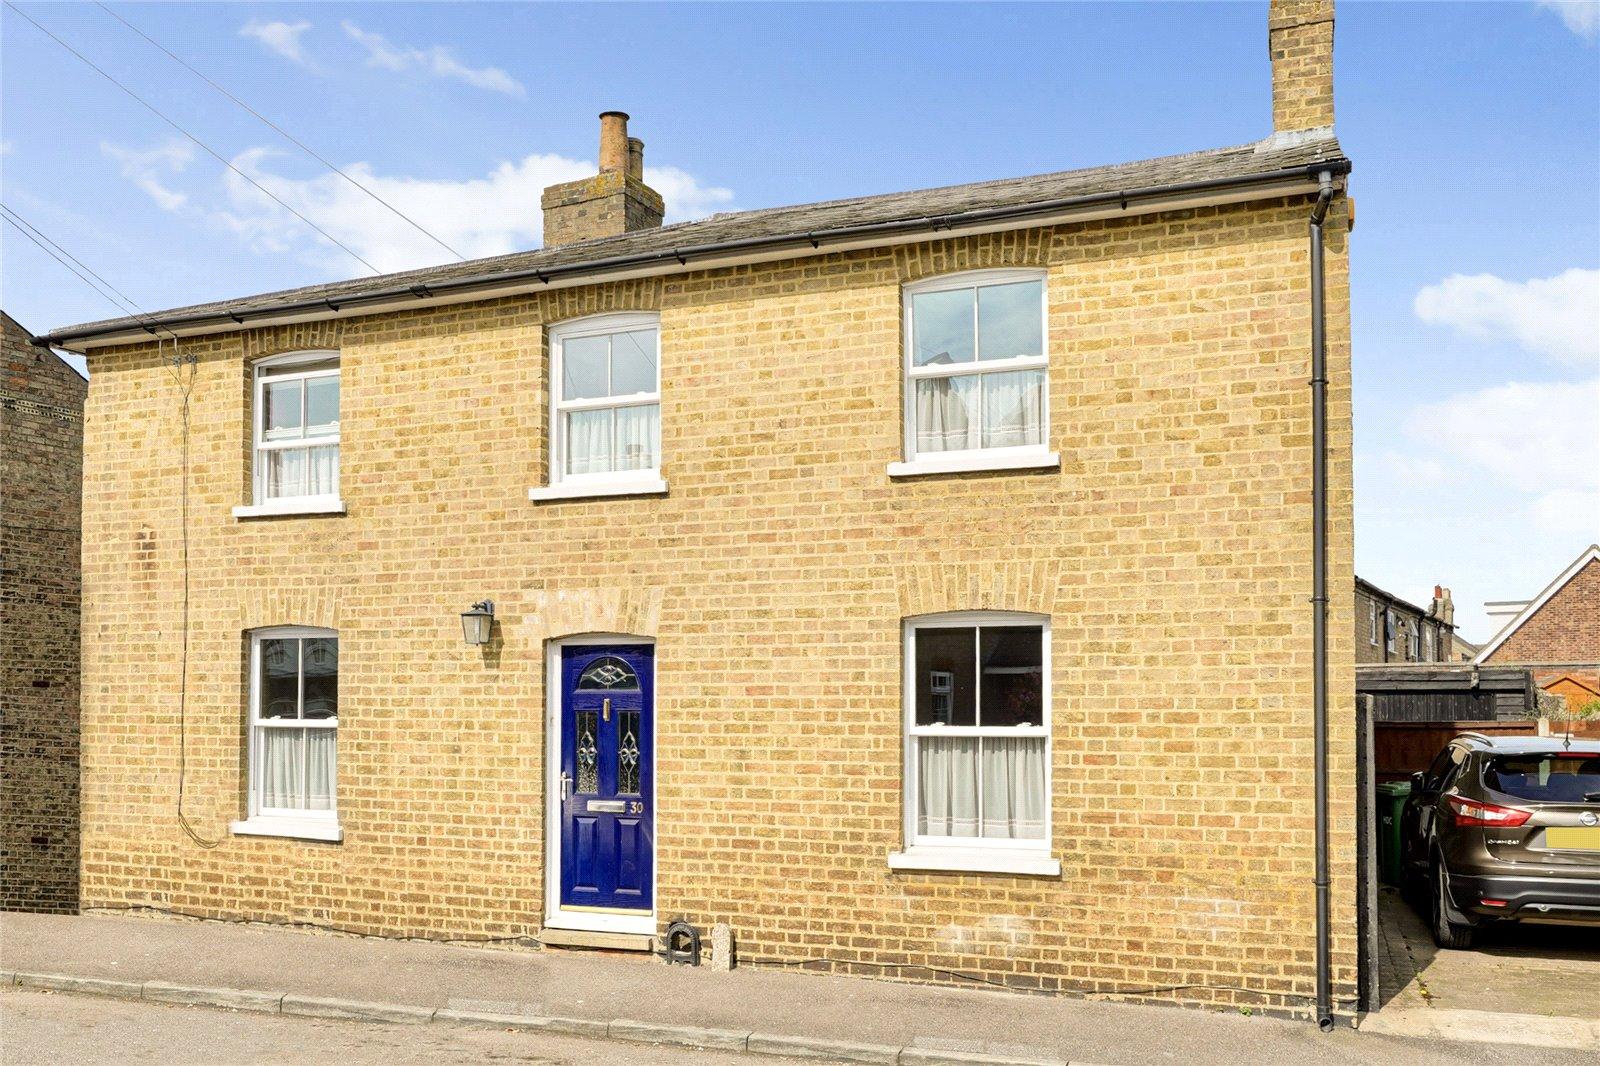 3 bed house for sale in Luke Street, Eynesbury  - Property Image 1